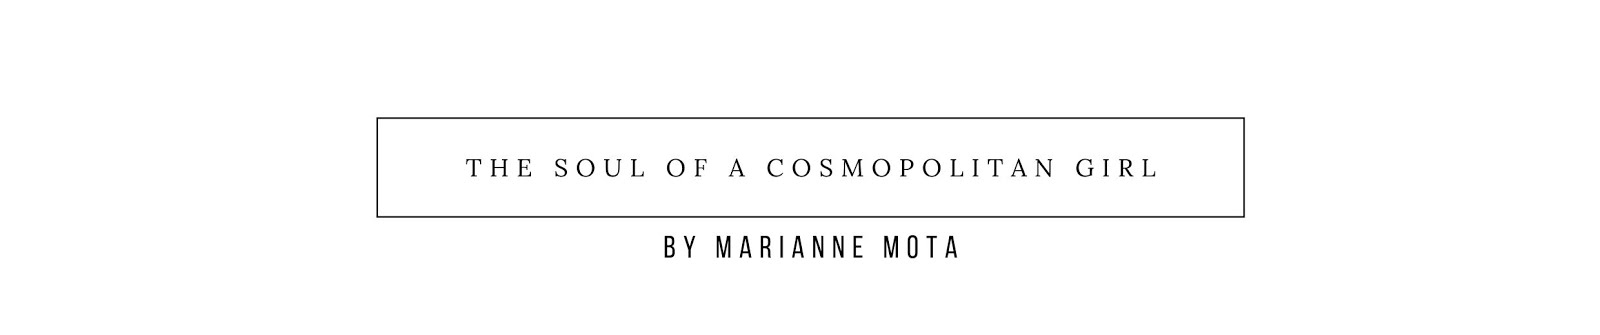 The Soul Of A Cosmopolitan Girl